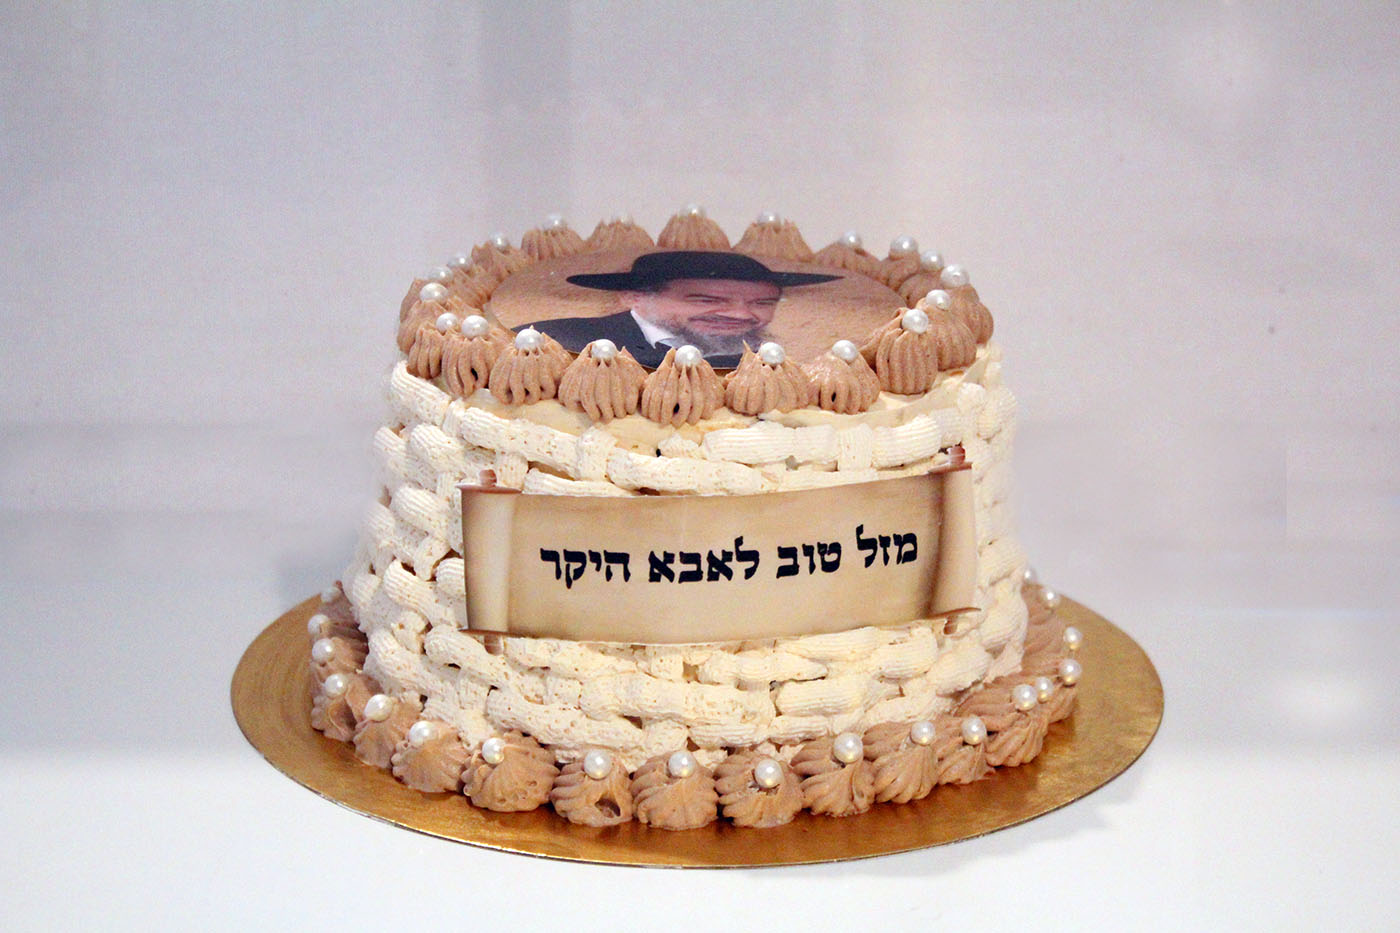 IMG 9554 - עוגת זילוף